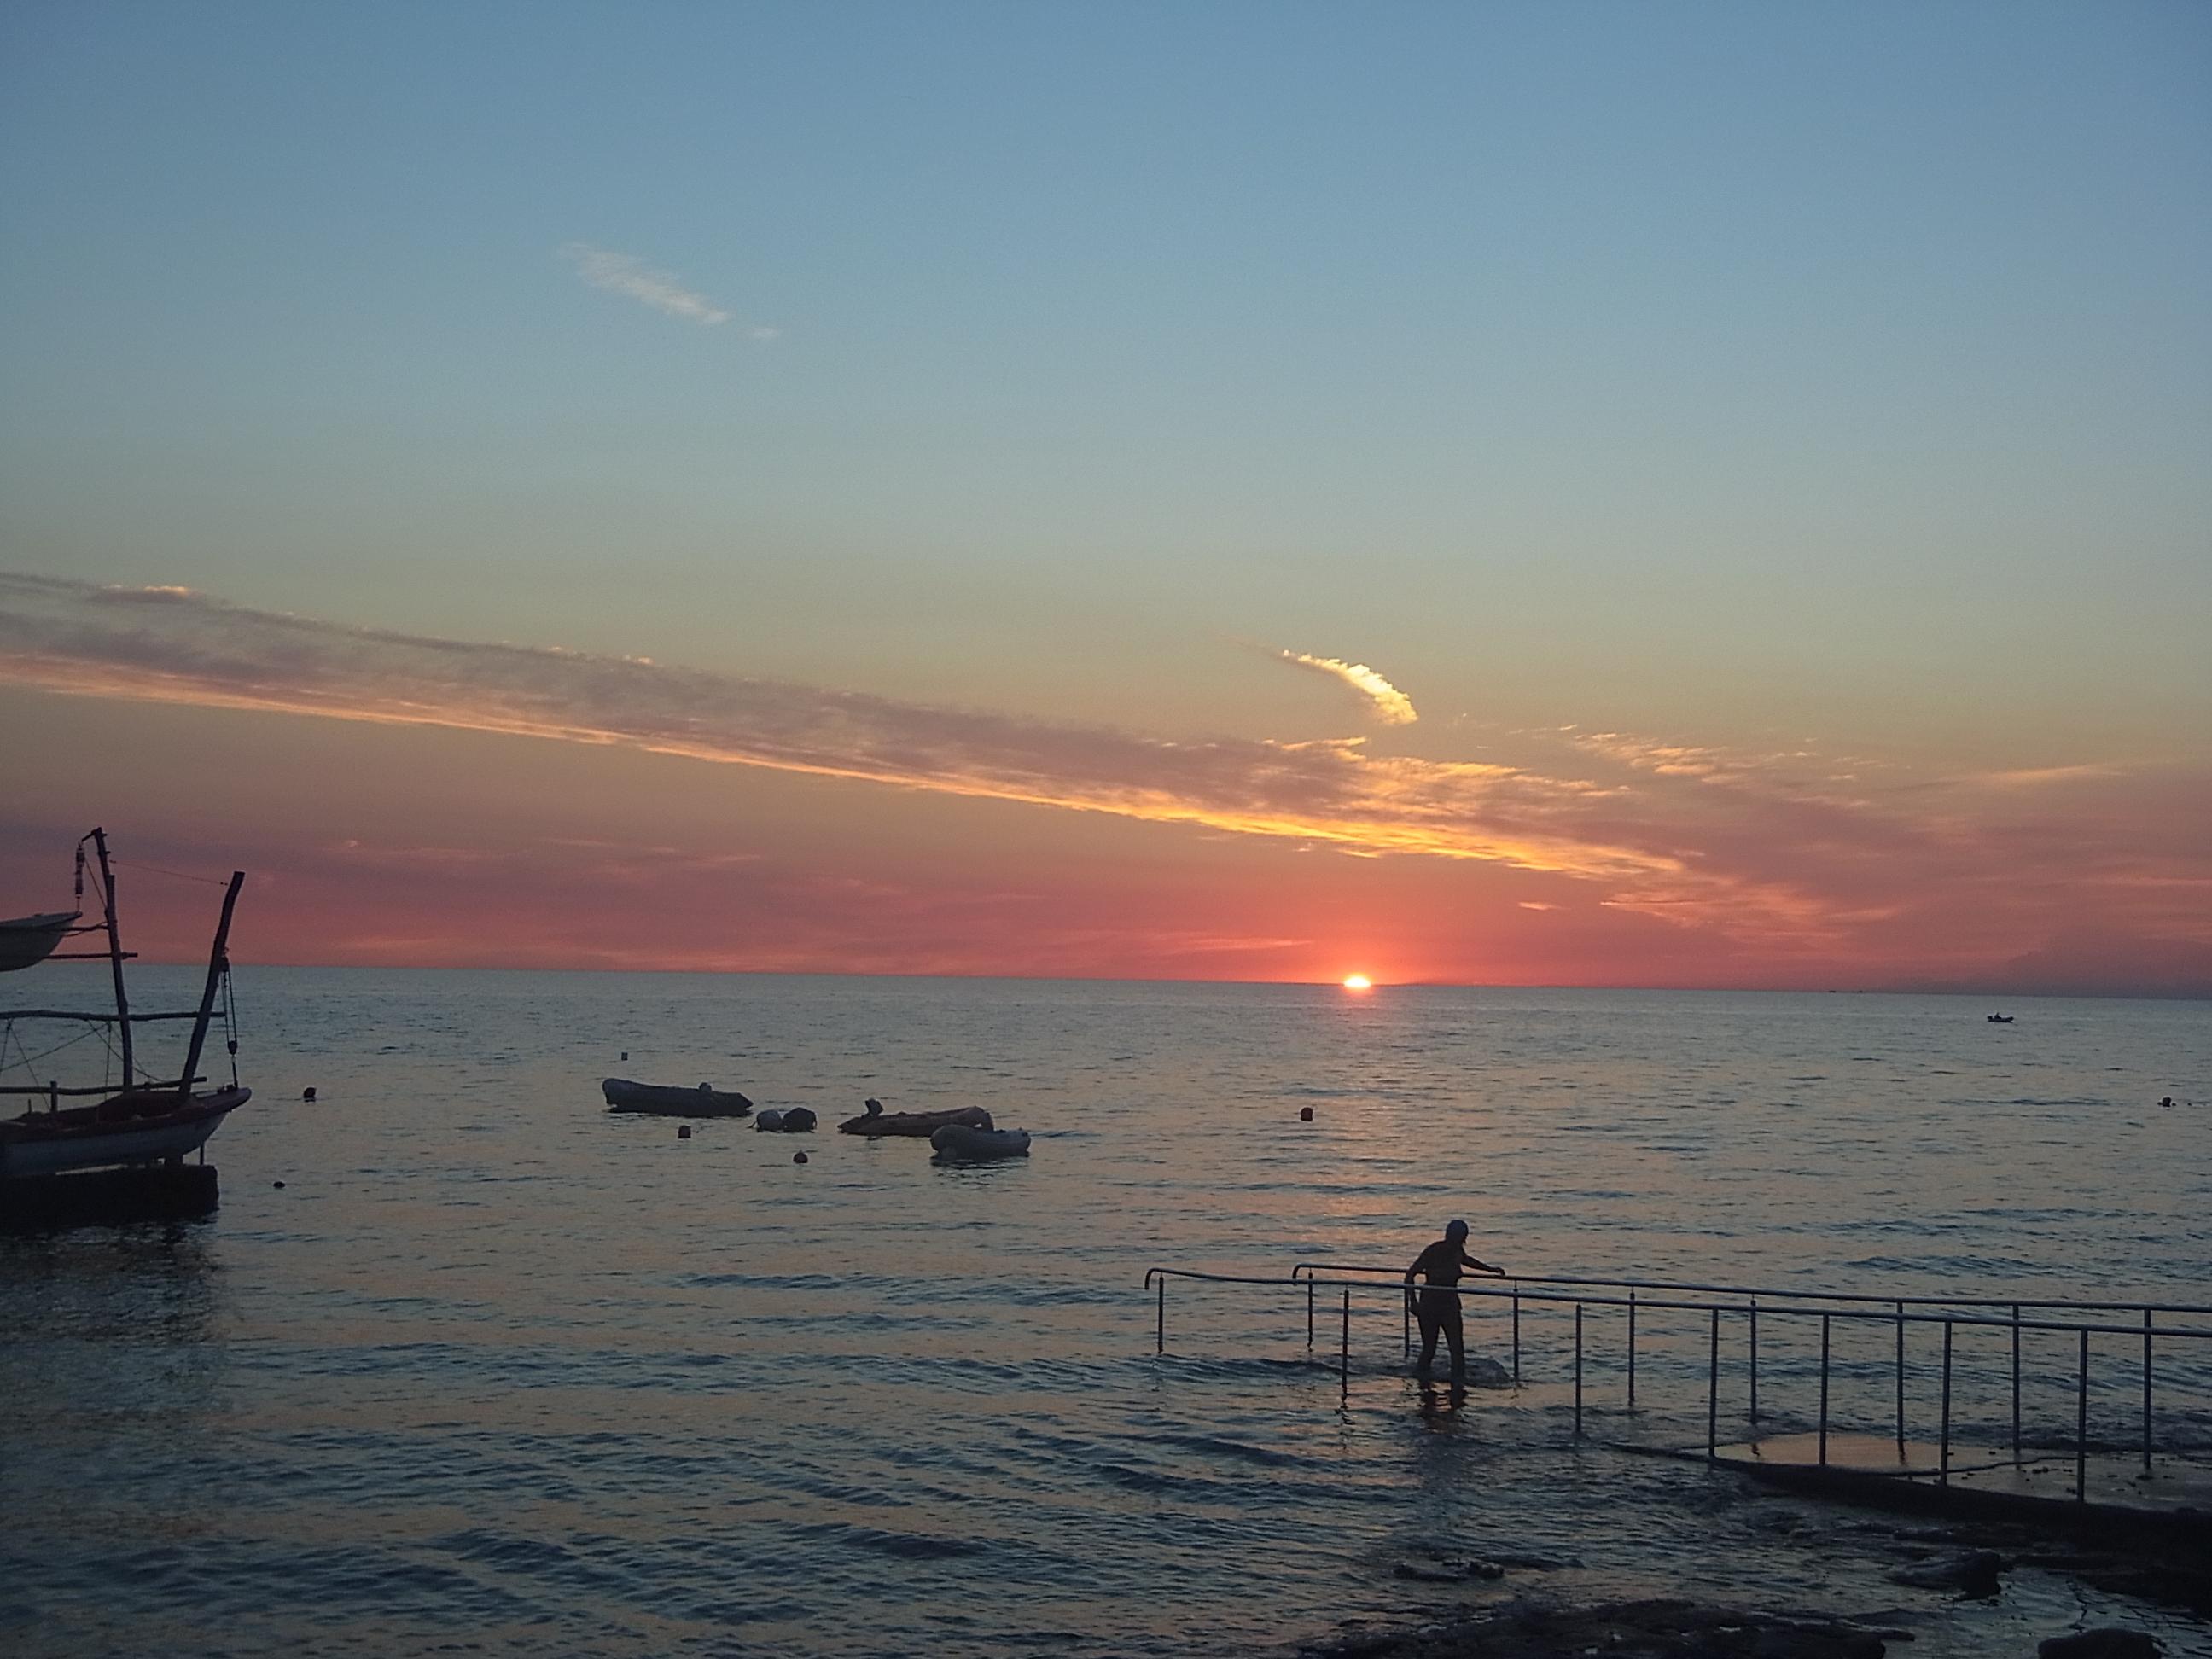 Sonnenuntergang am Kap